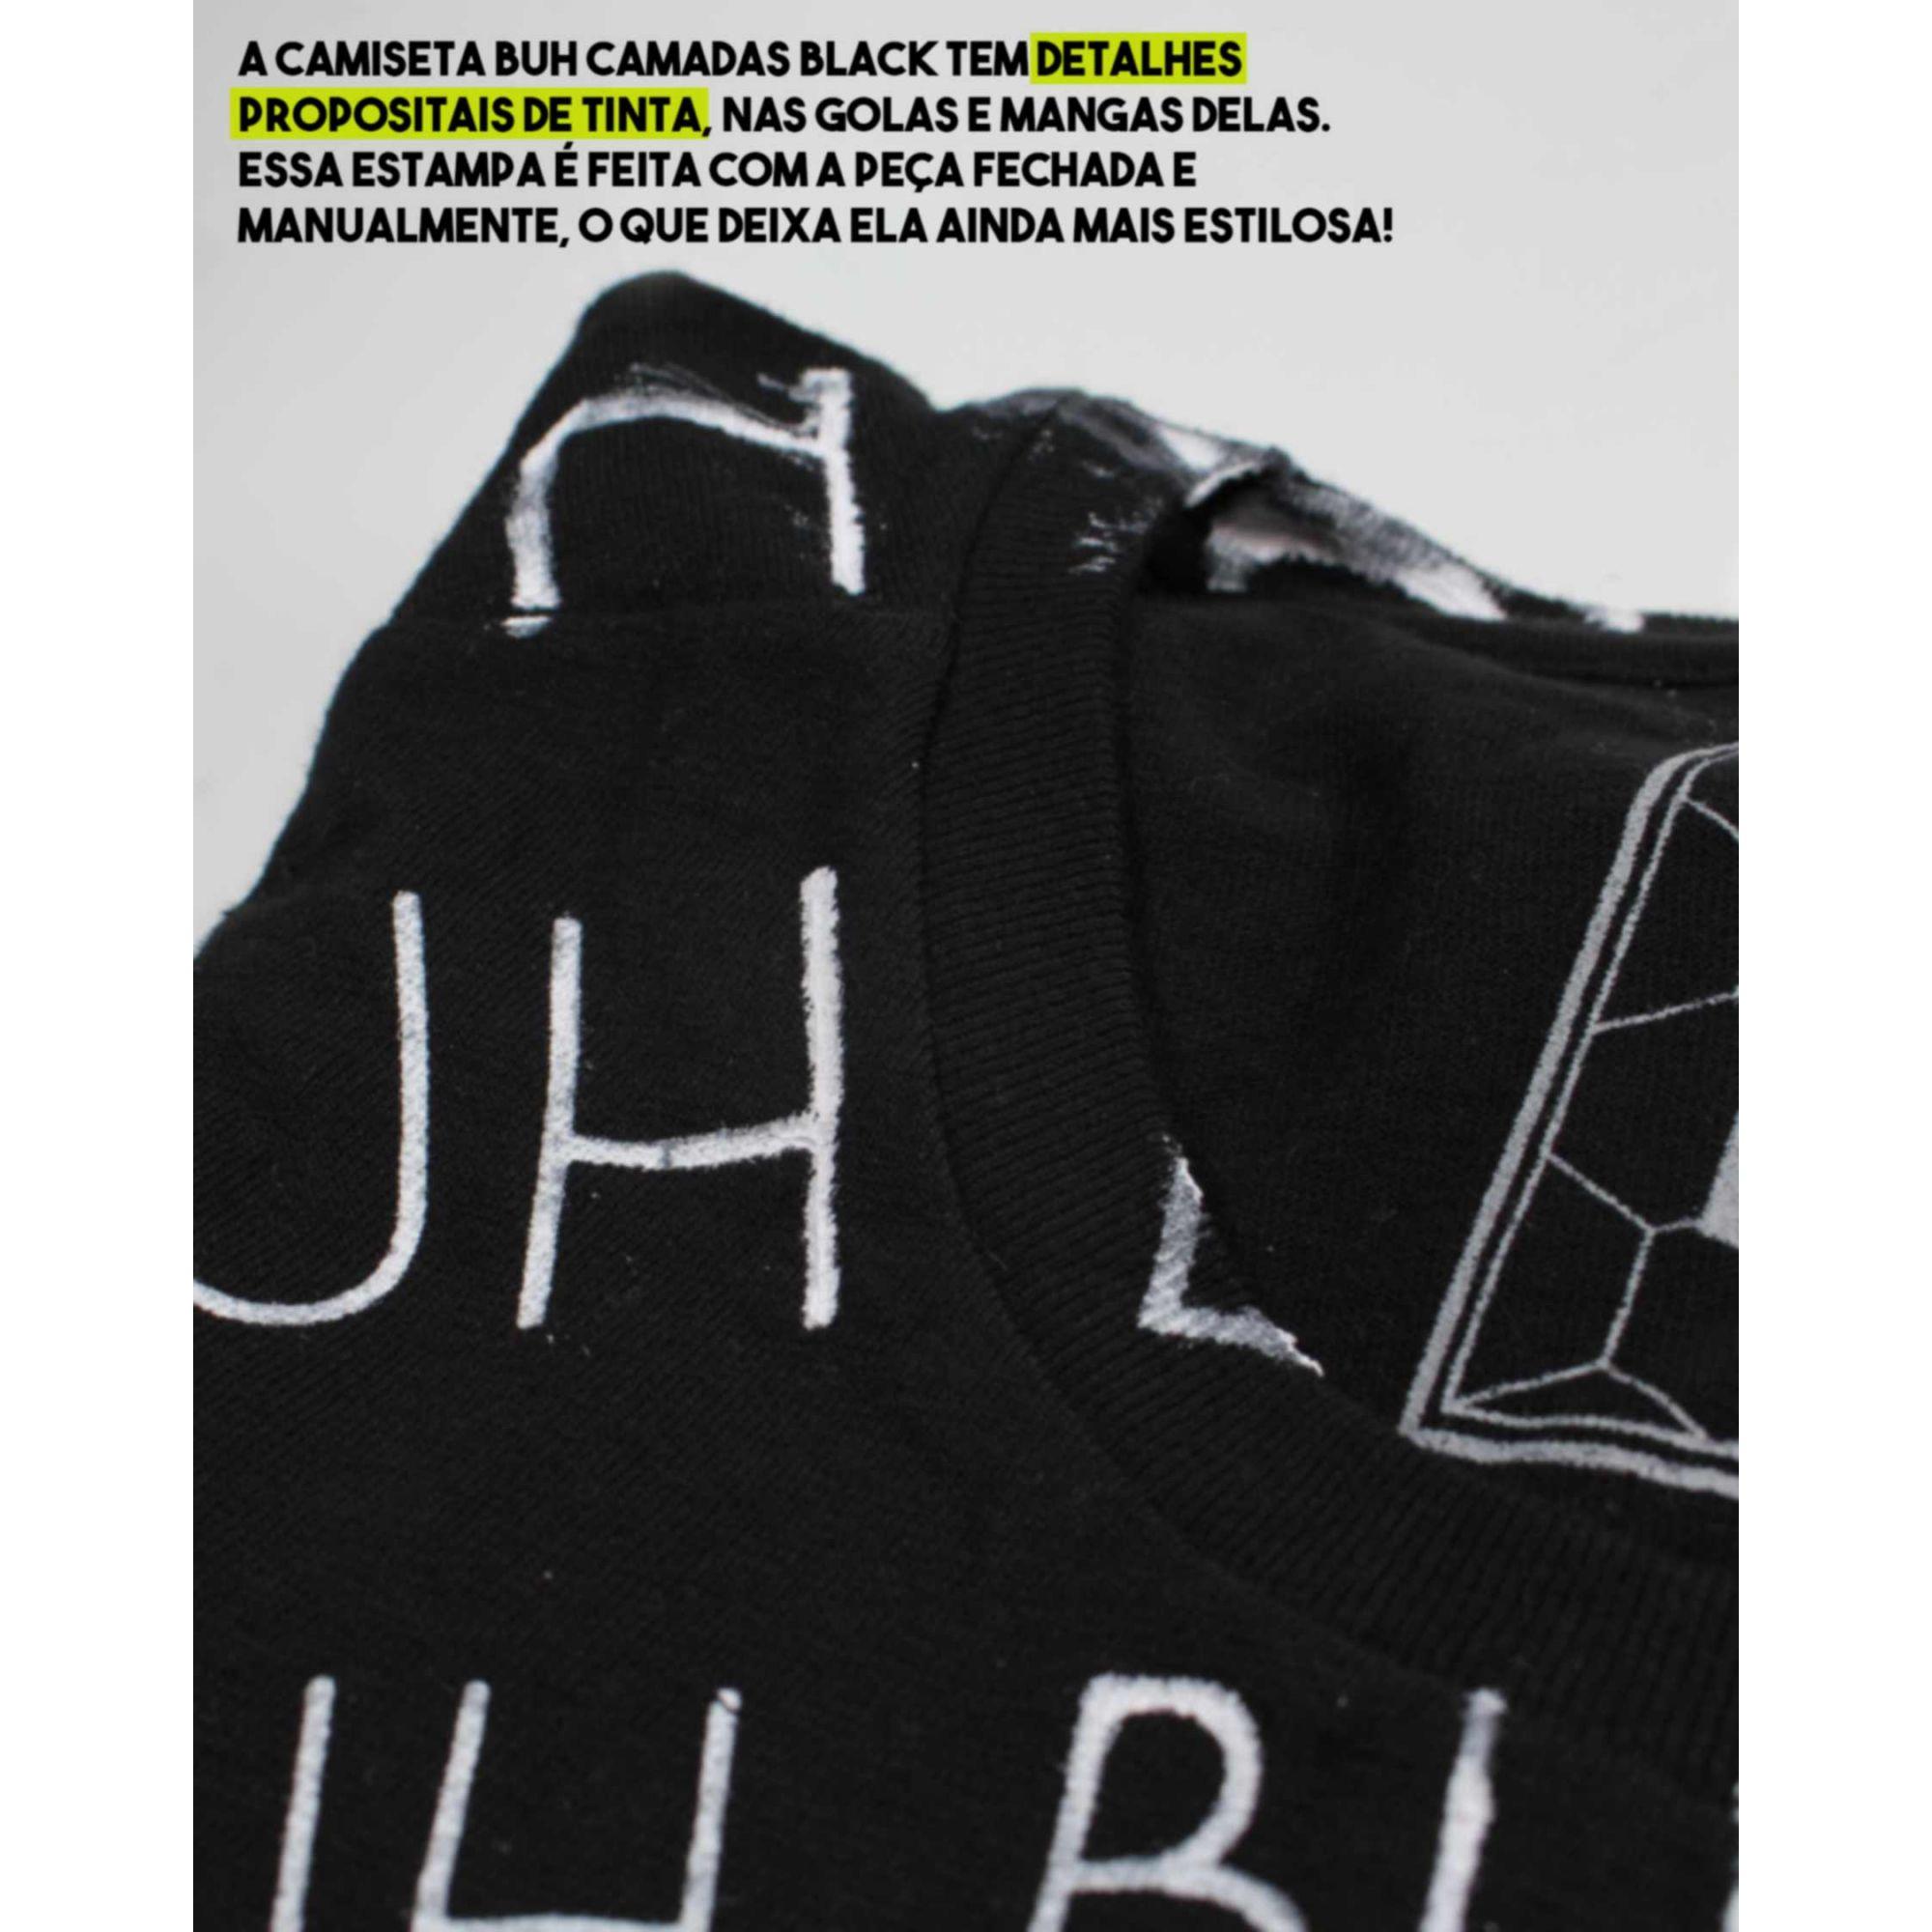 Camiseta Buh Camadas Black